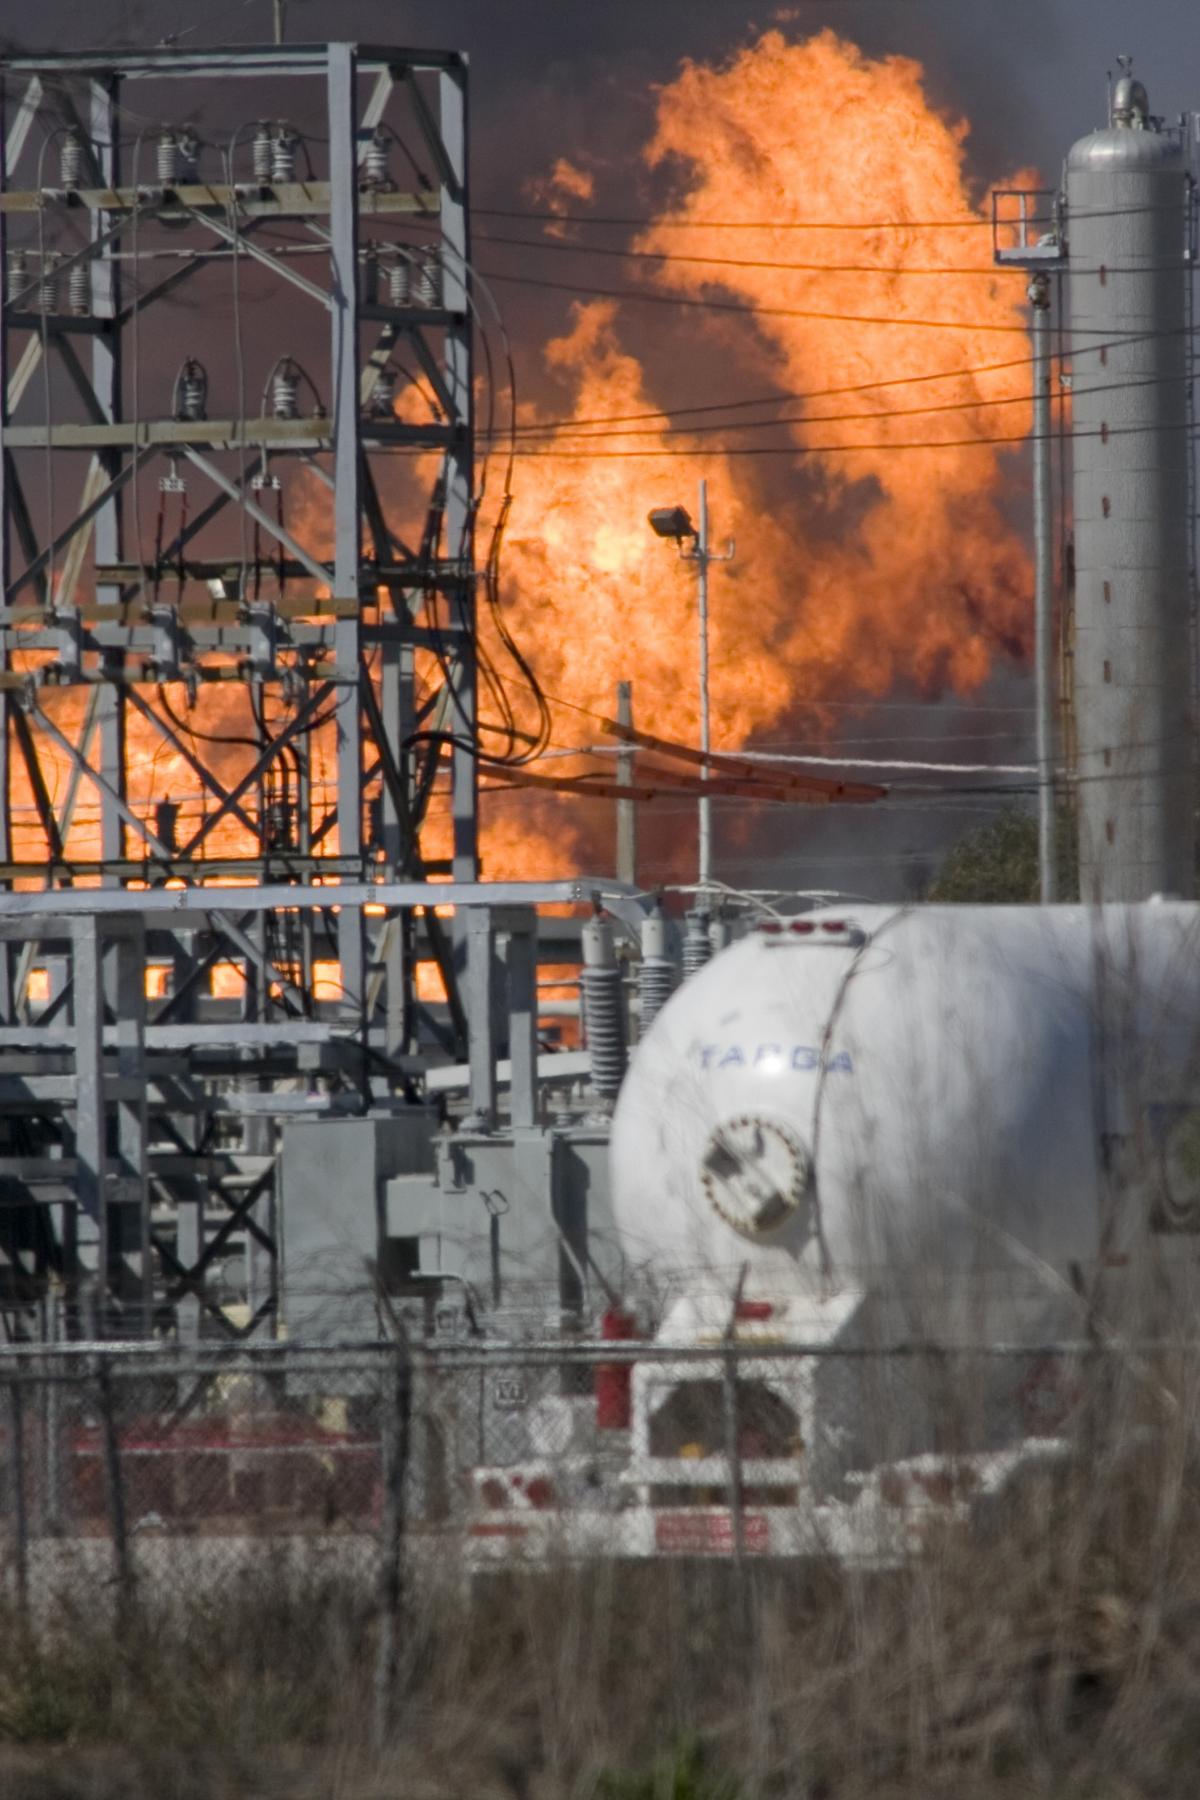 Tragedy strikes on Christmas eve as Chikason gas plant explodes in Nigeria